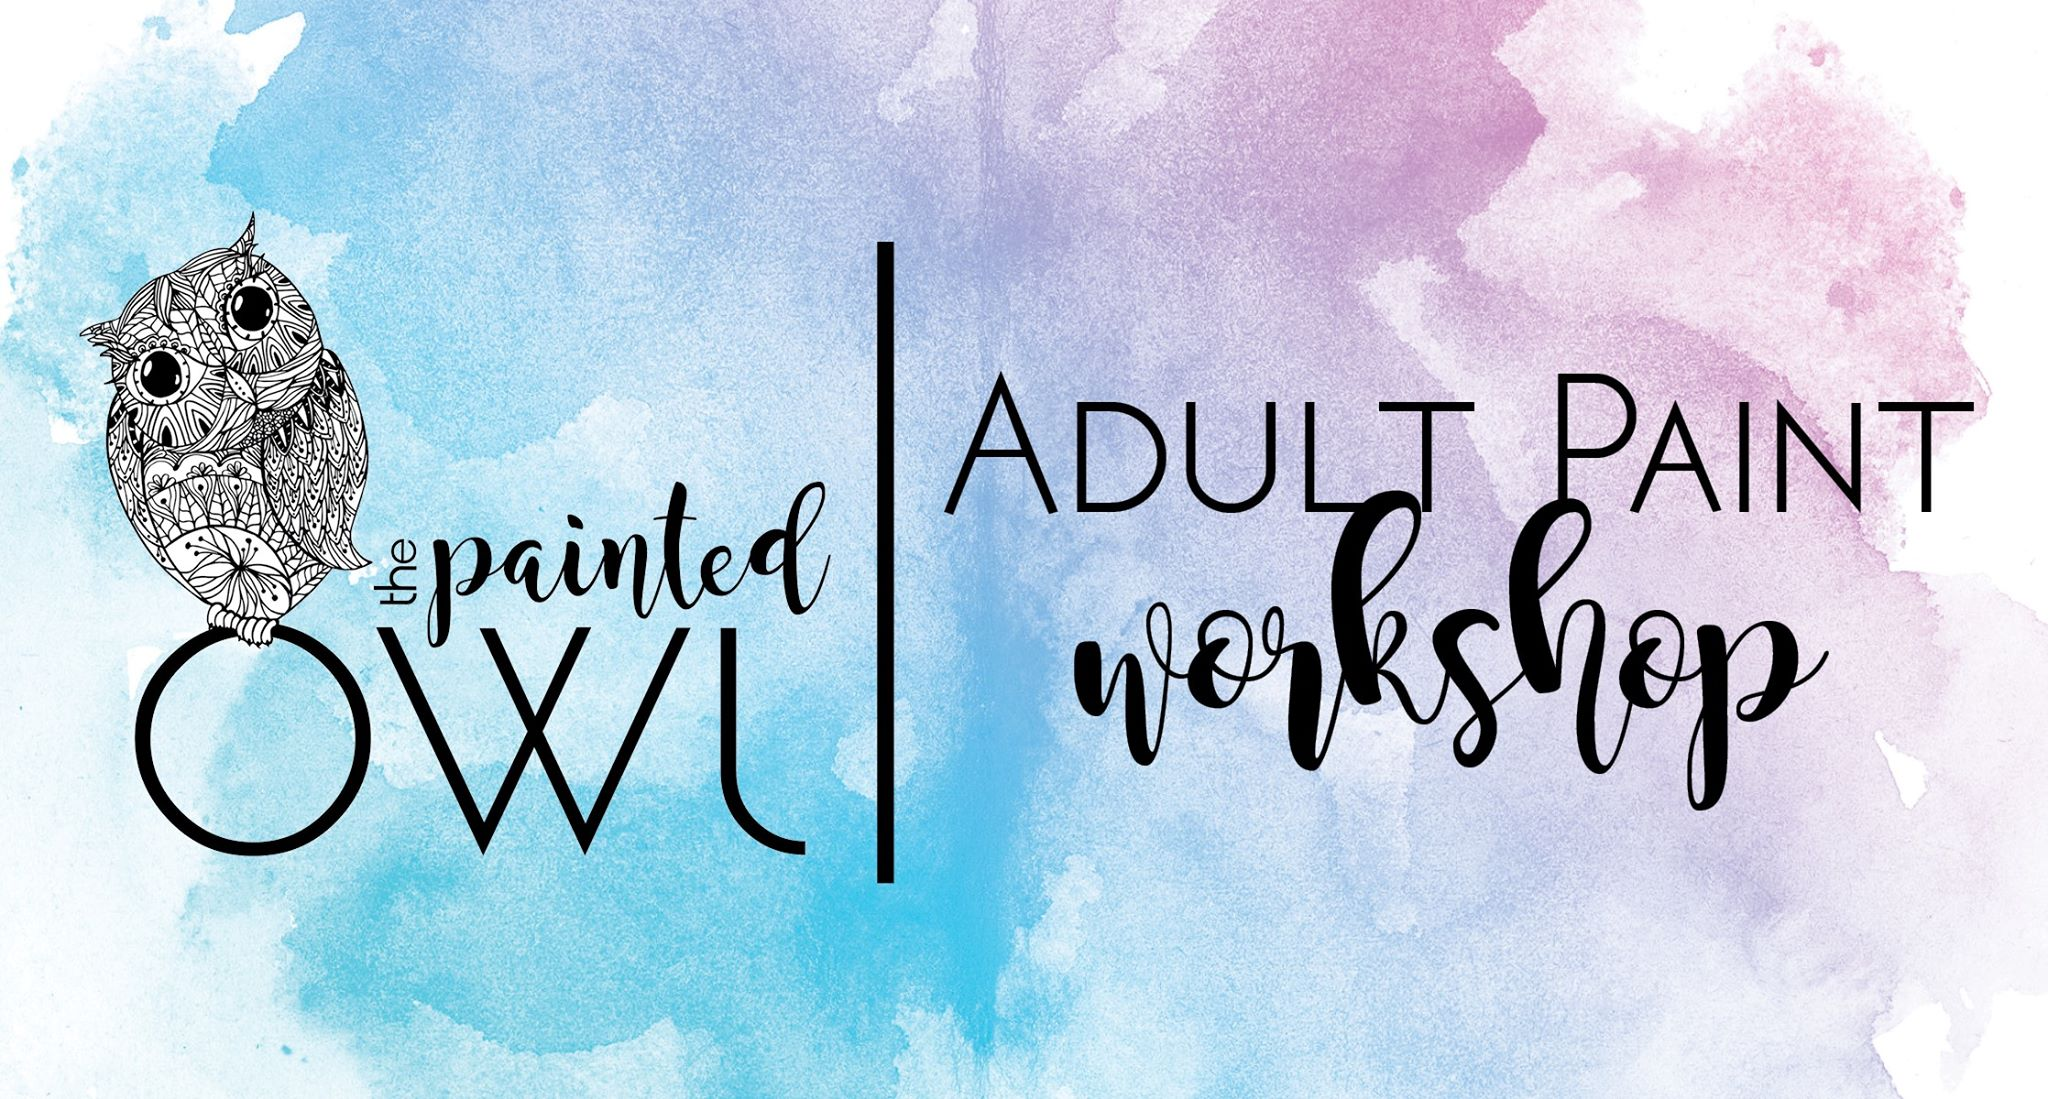 adult paint workshop.jpg